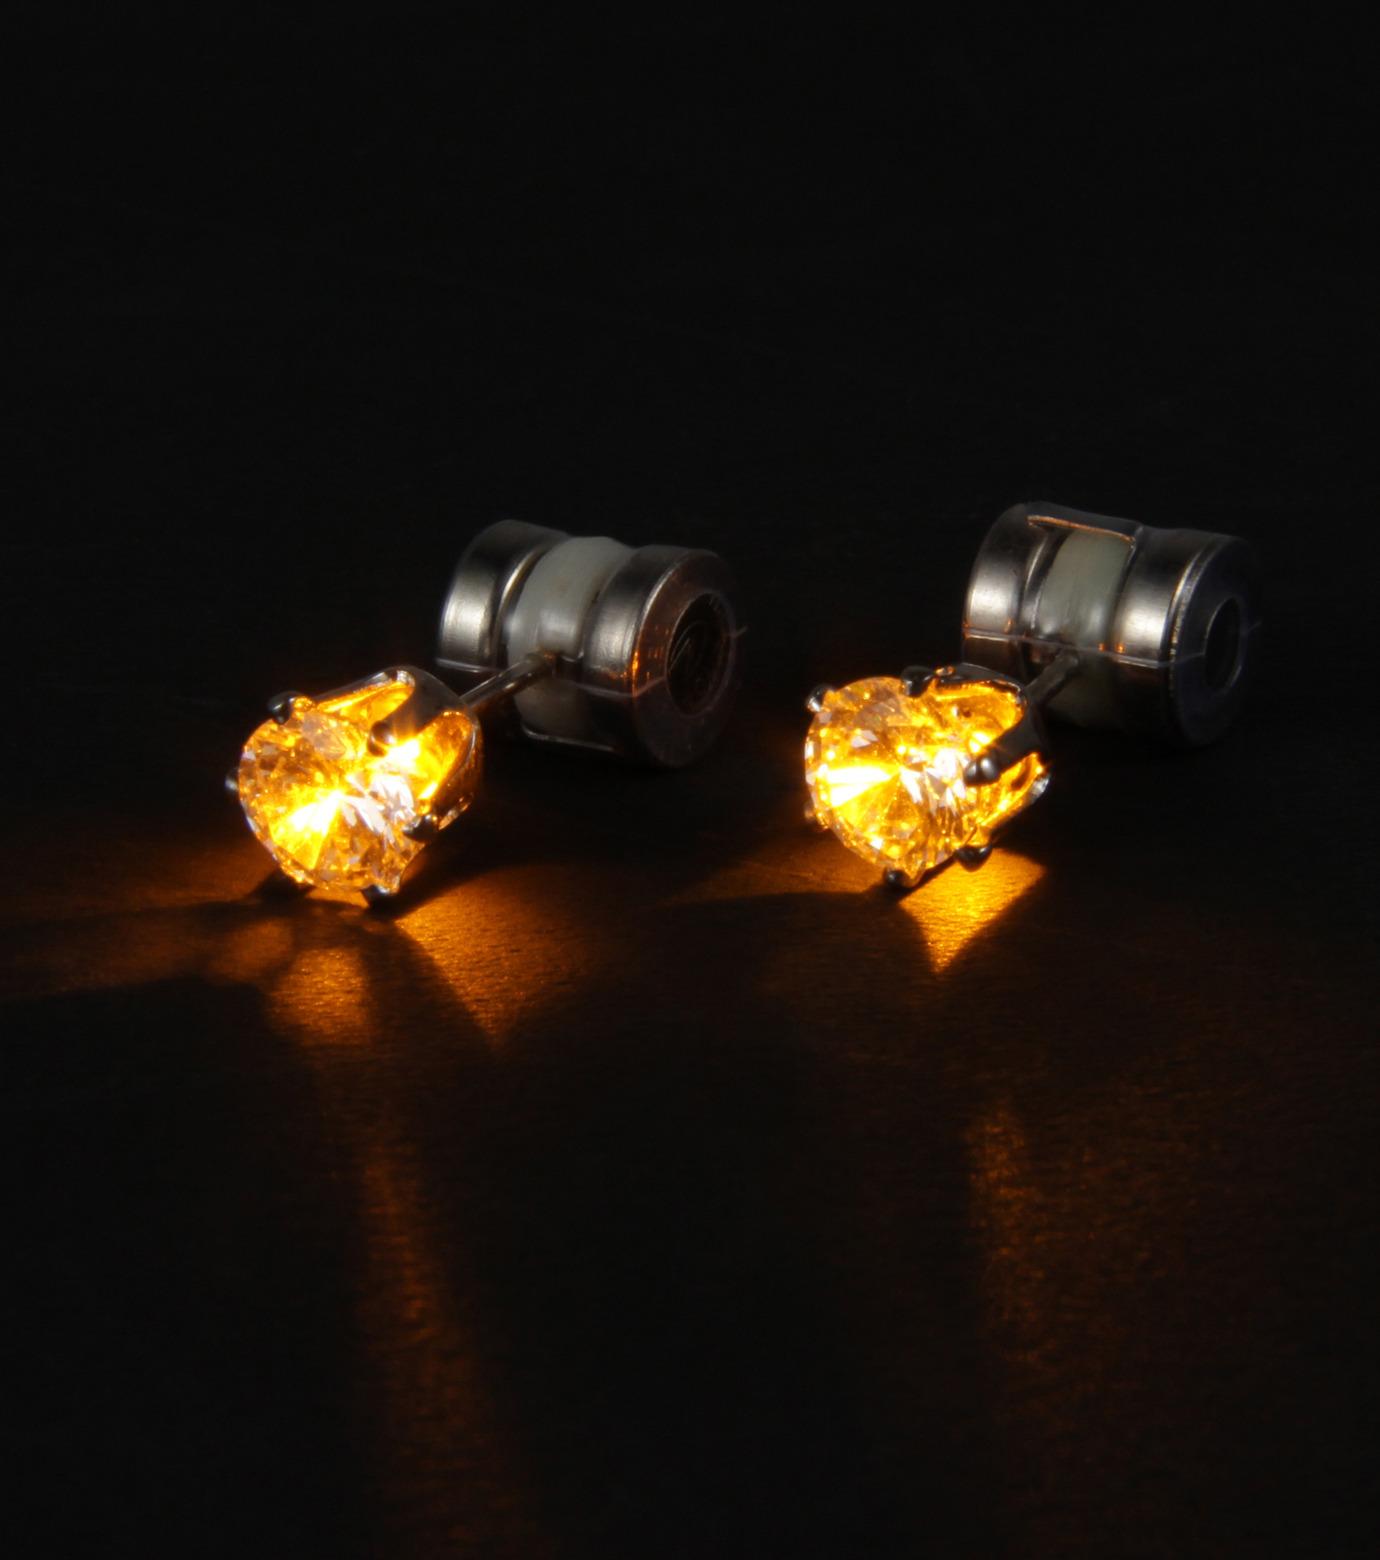 Night Ice(ナイトアイス)のOriginal Yellow-YELLOW(ガジェット/ライト/gadgets/light)-Original-32 拡大詳細画像2